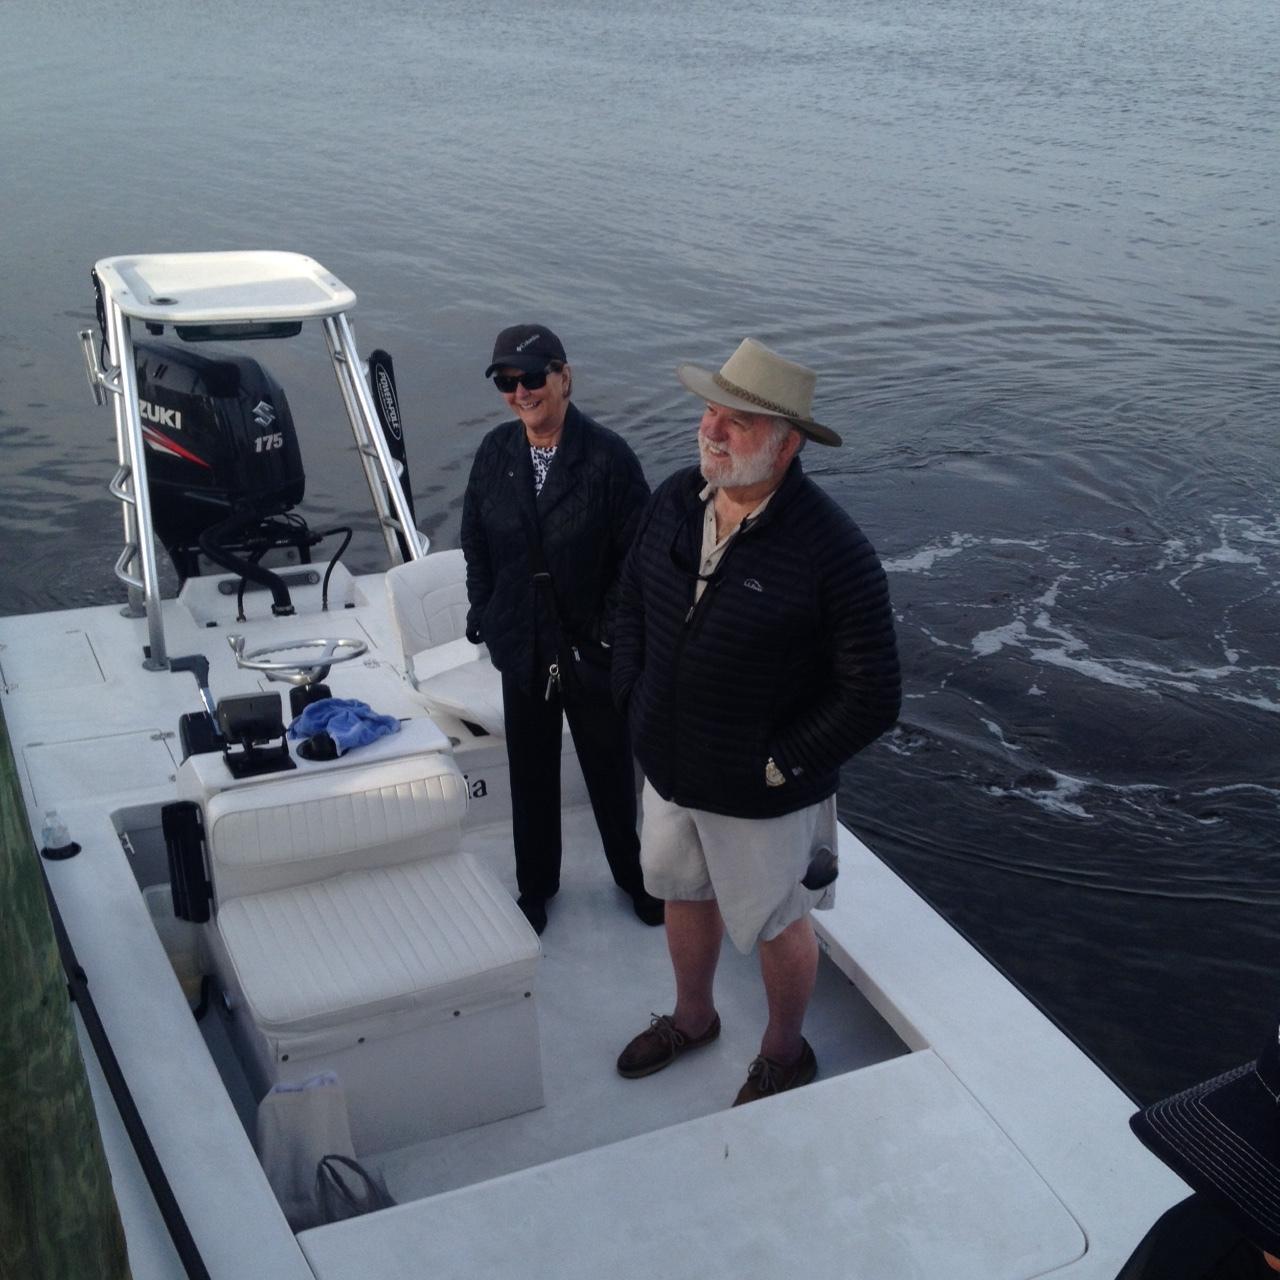 Papa Tom and Mama Linda off to fish.